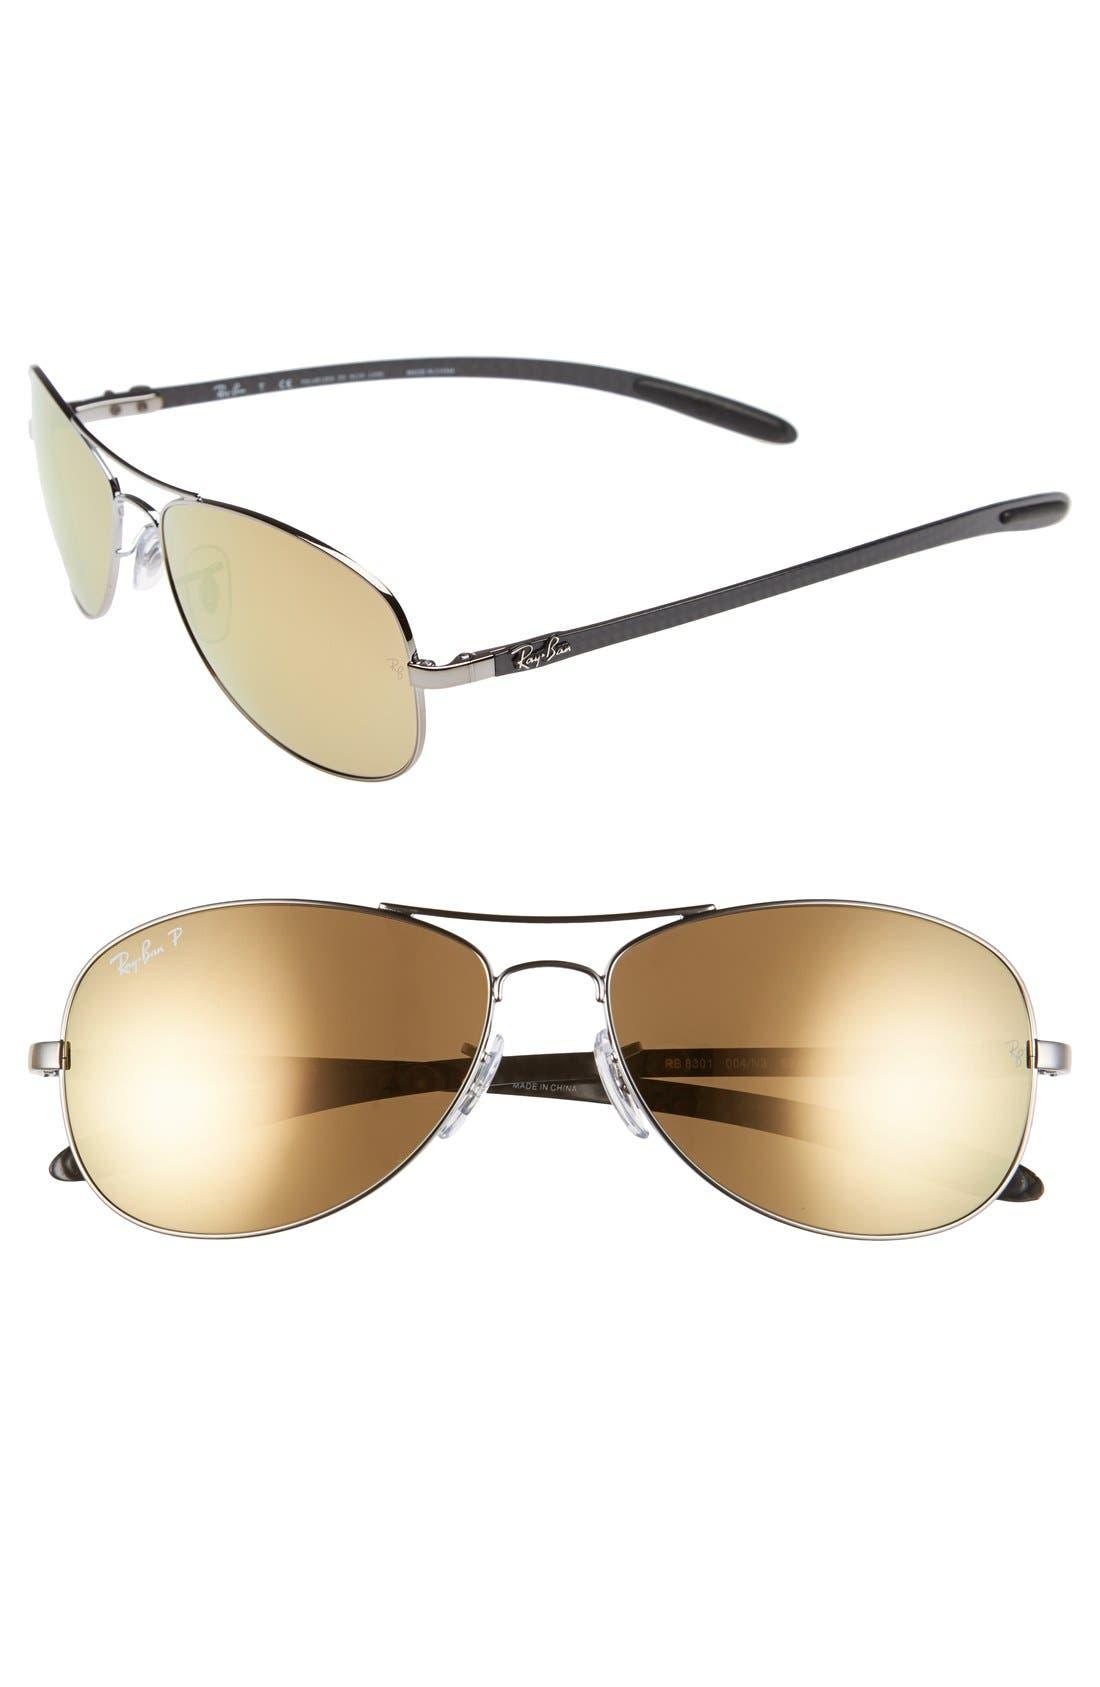 Alternate Image 1 Selected - Ray-Ban 'TECH' 59mm Polarized Aviator Sunglasses